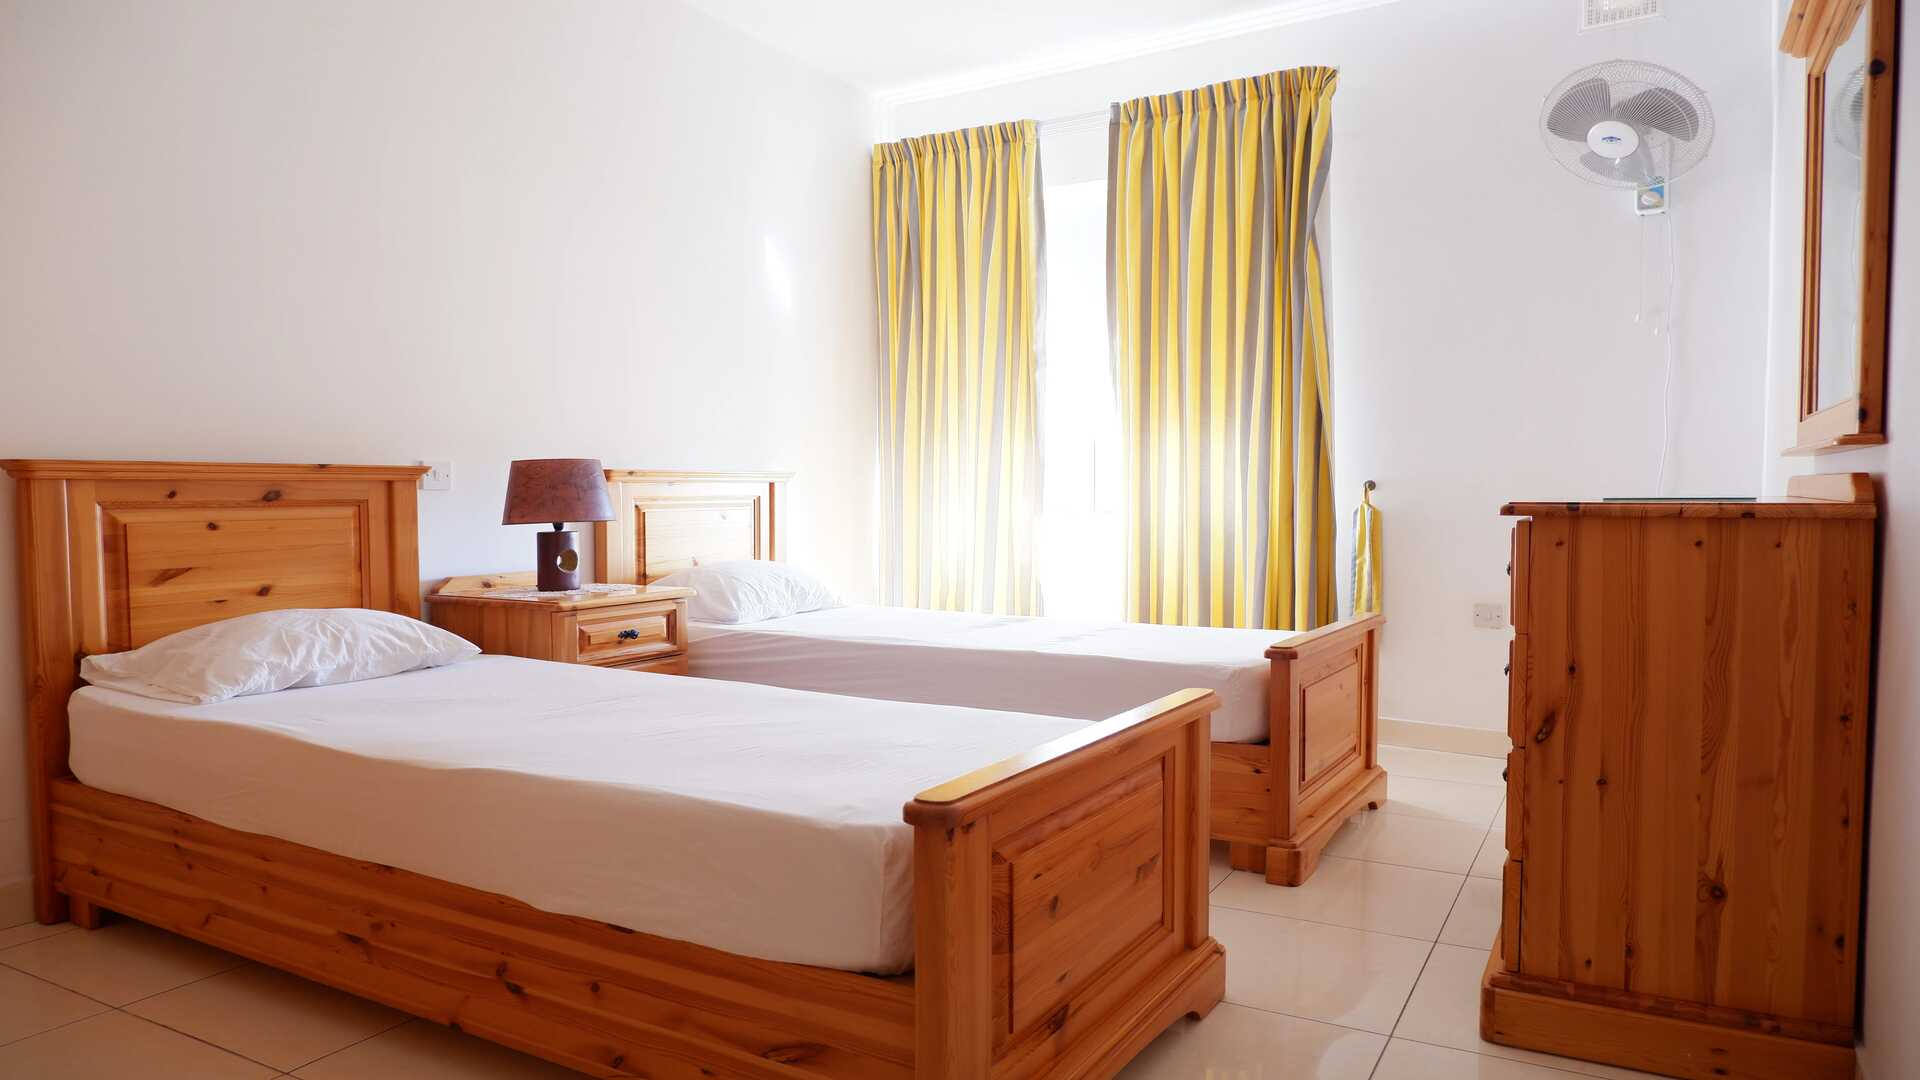 Suites at Shamrock Apartments